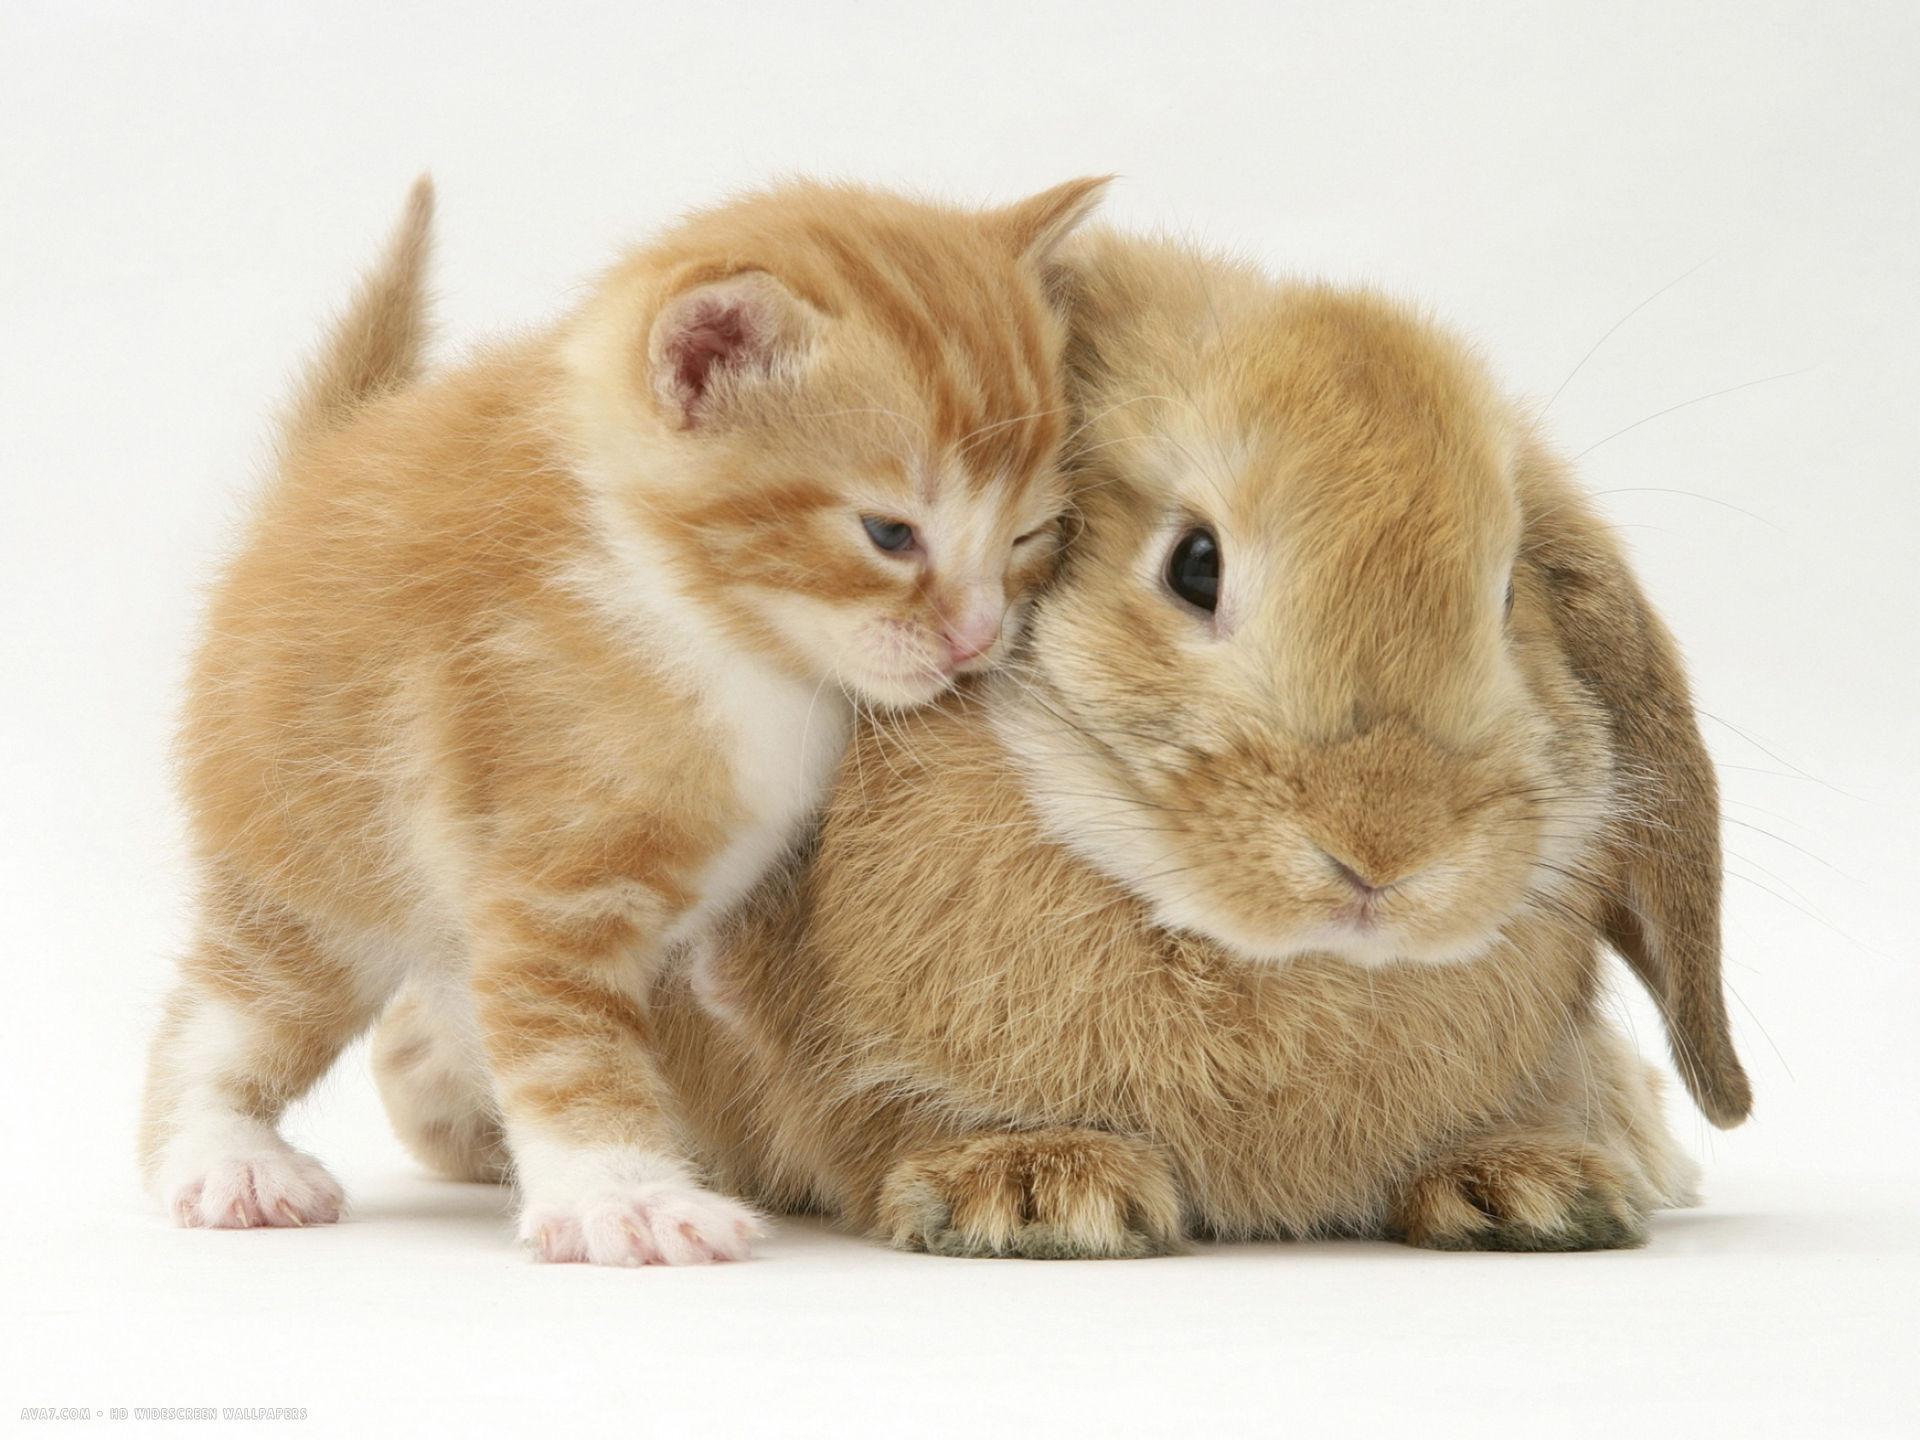 domestic kitten felis catus next to bunny domestic rabbit